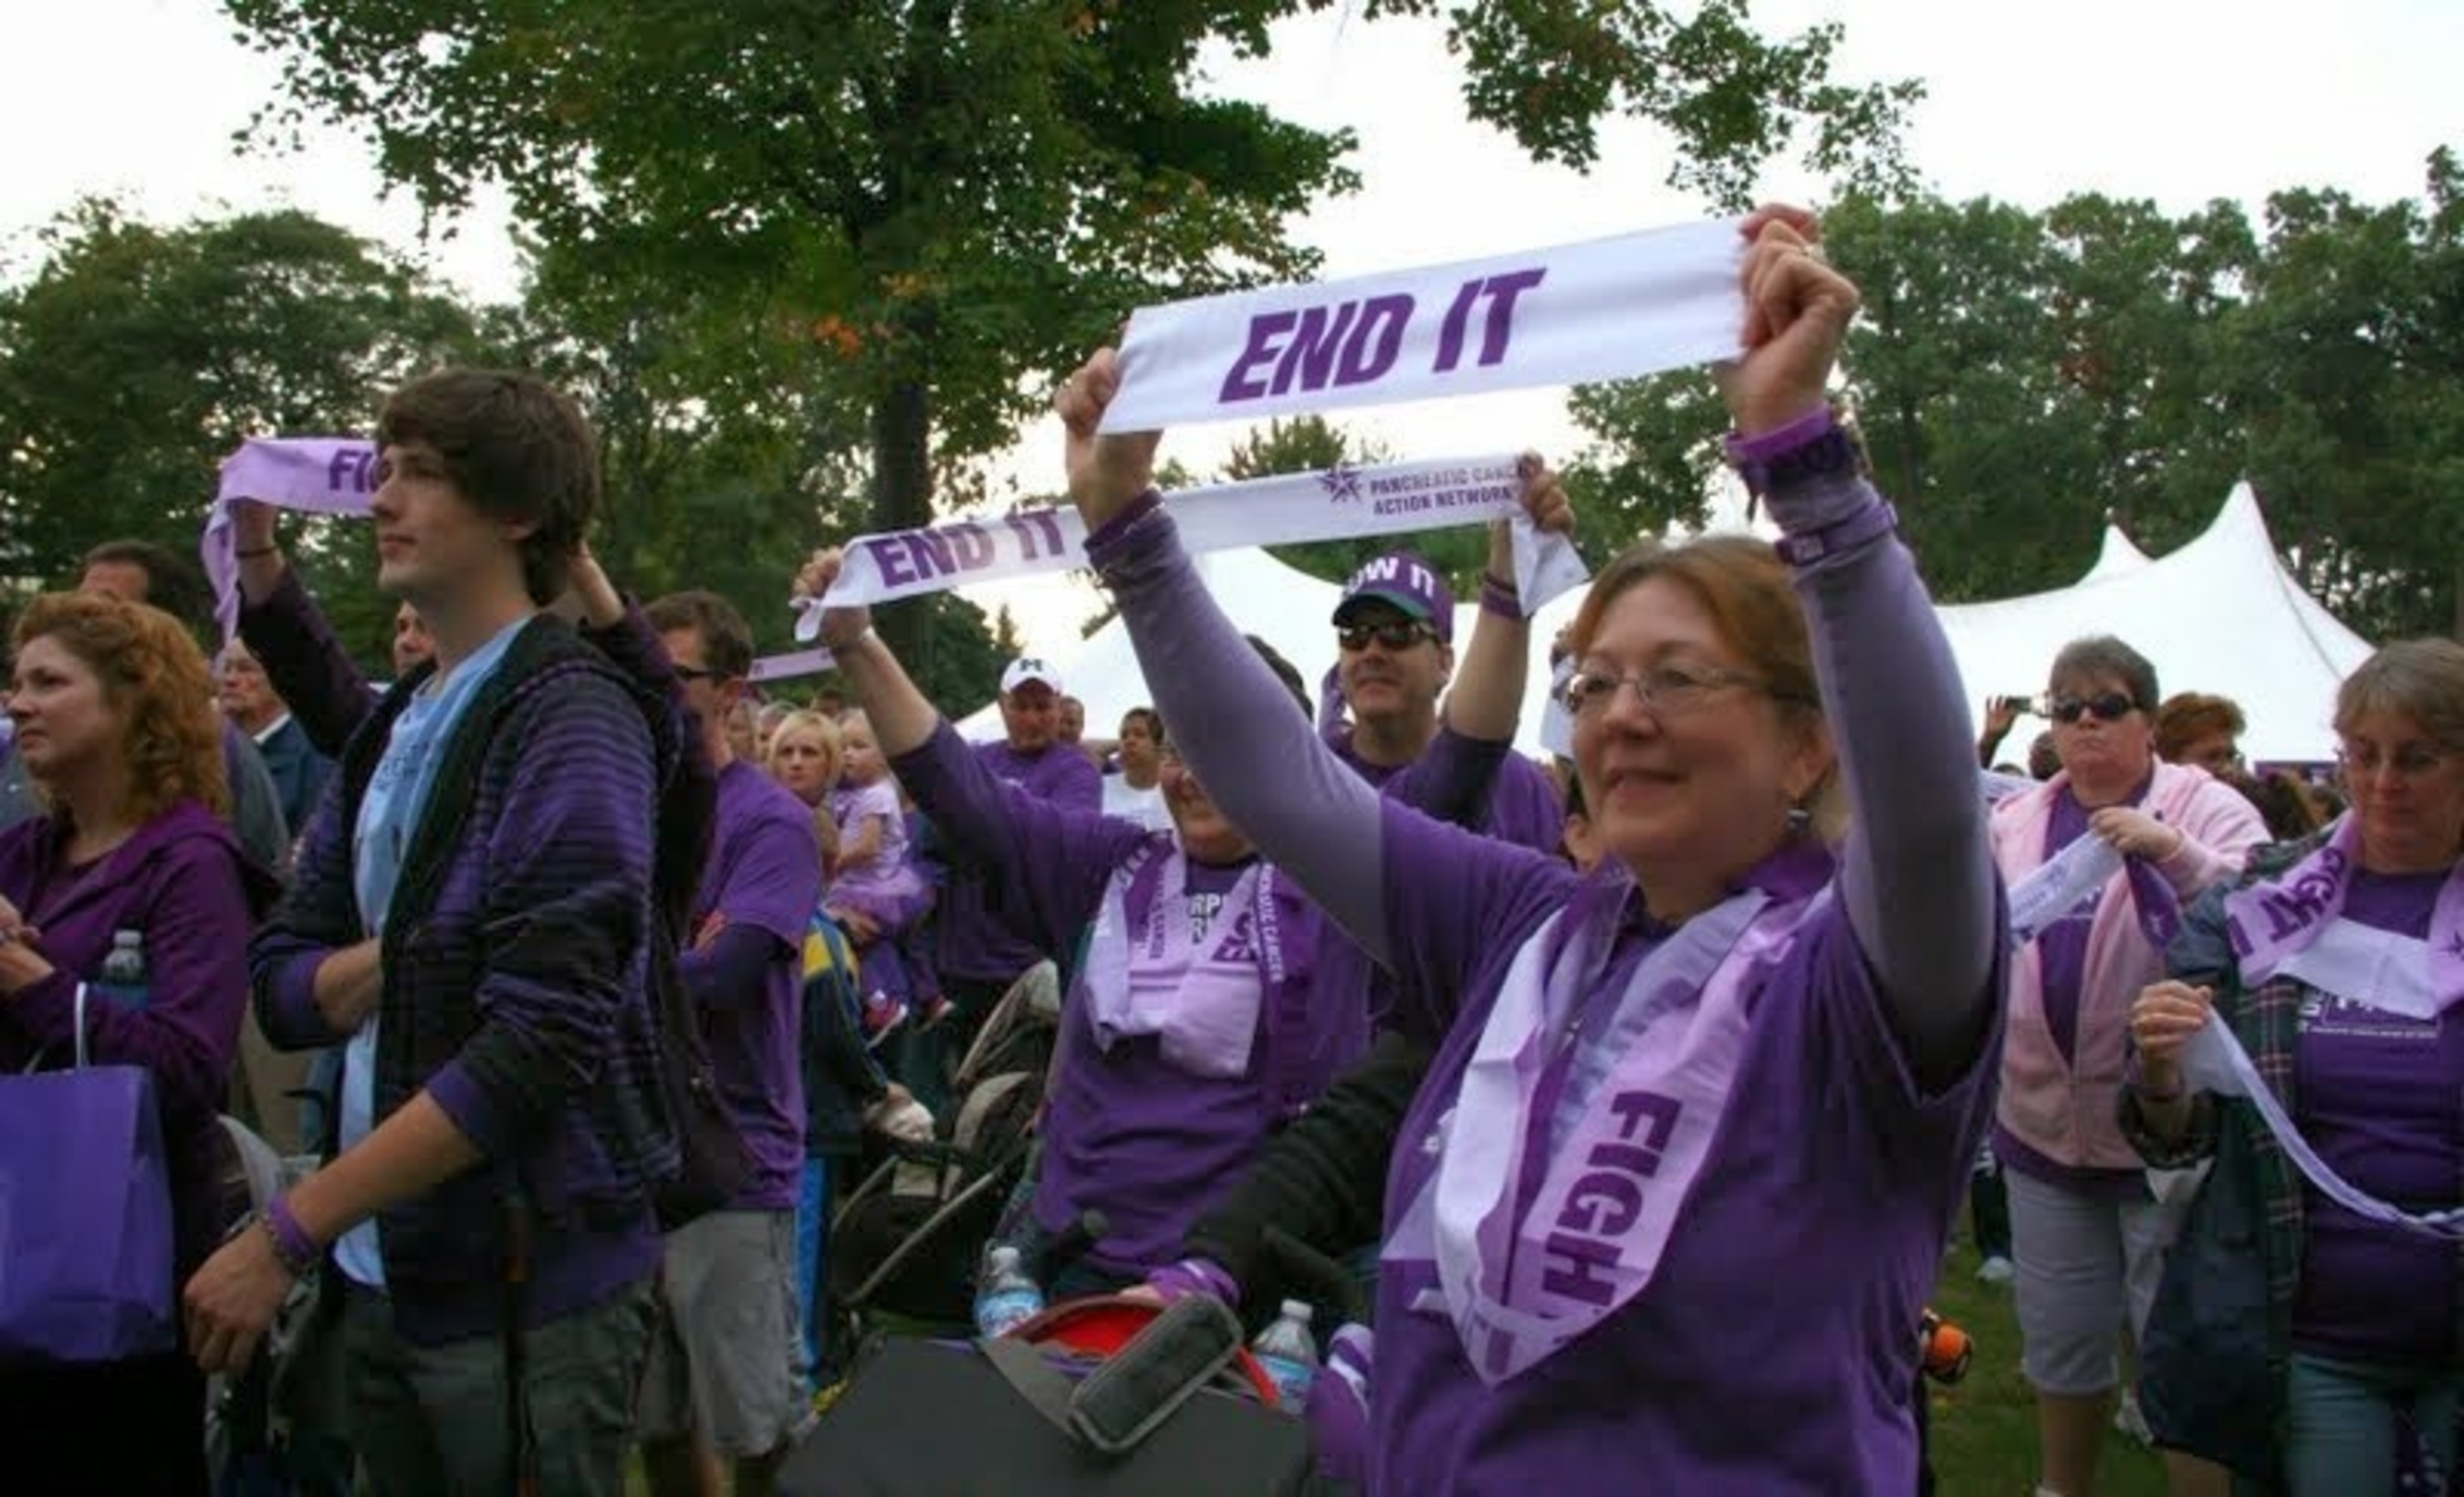 Previous years PurpleStride Detroit event participants raising awareness about pancreatic cancer